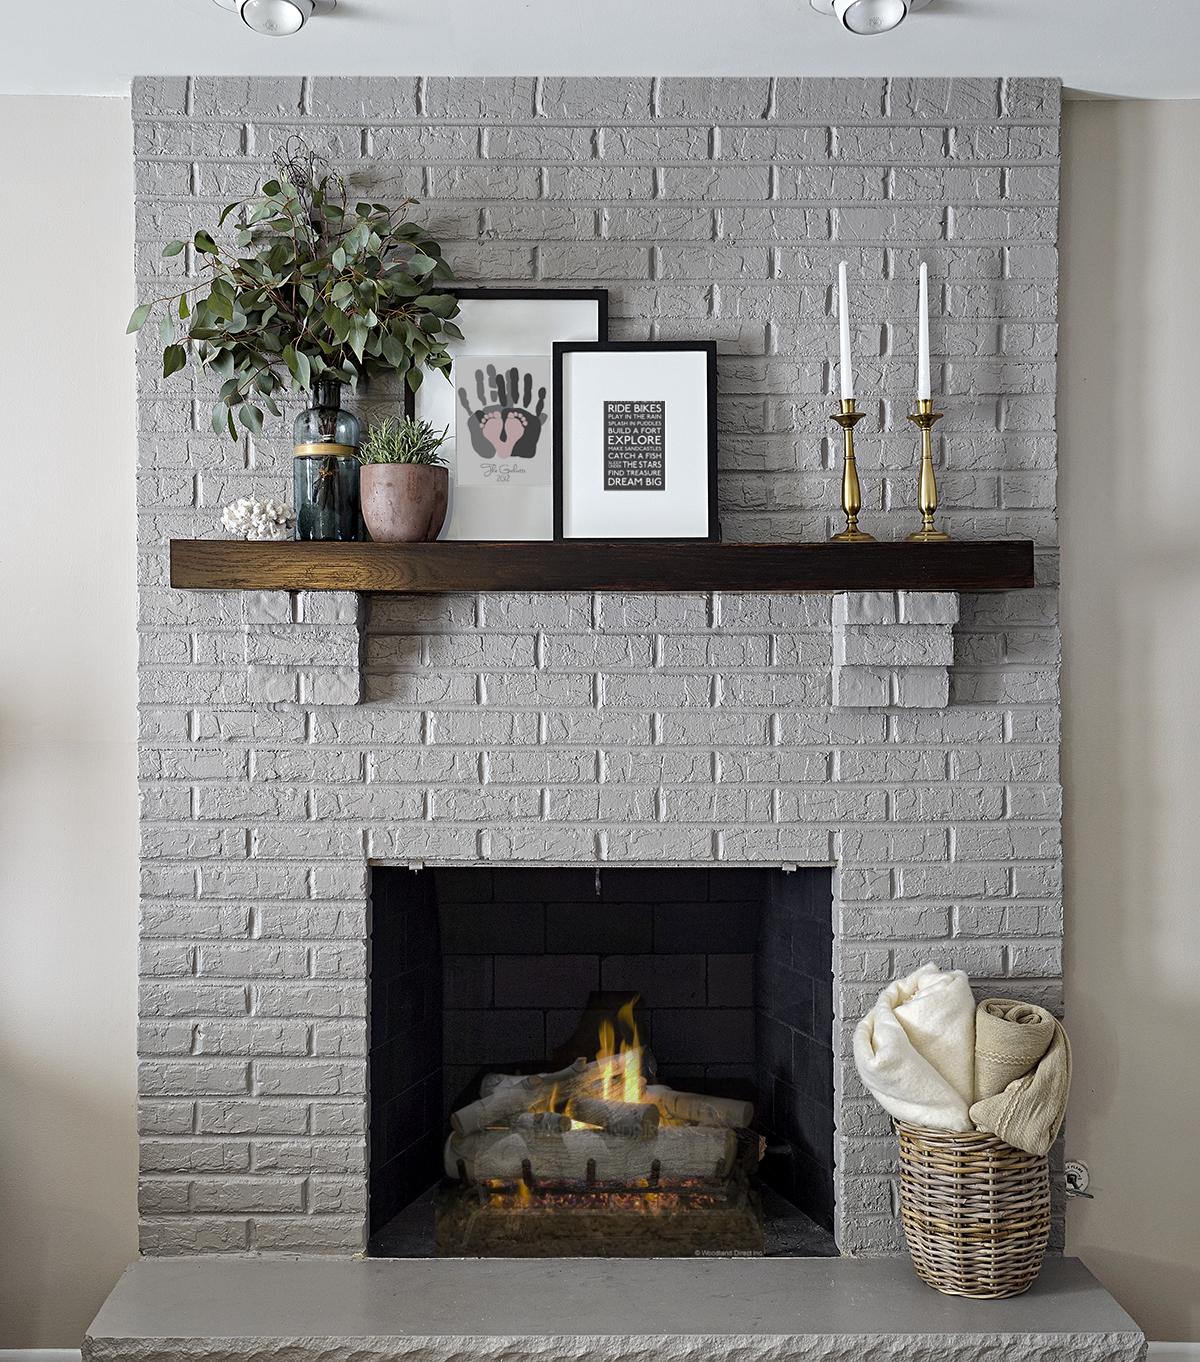 flossmoor fireplace 2 after.jpg